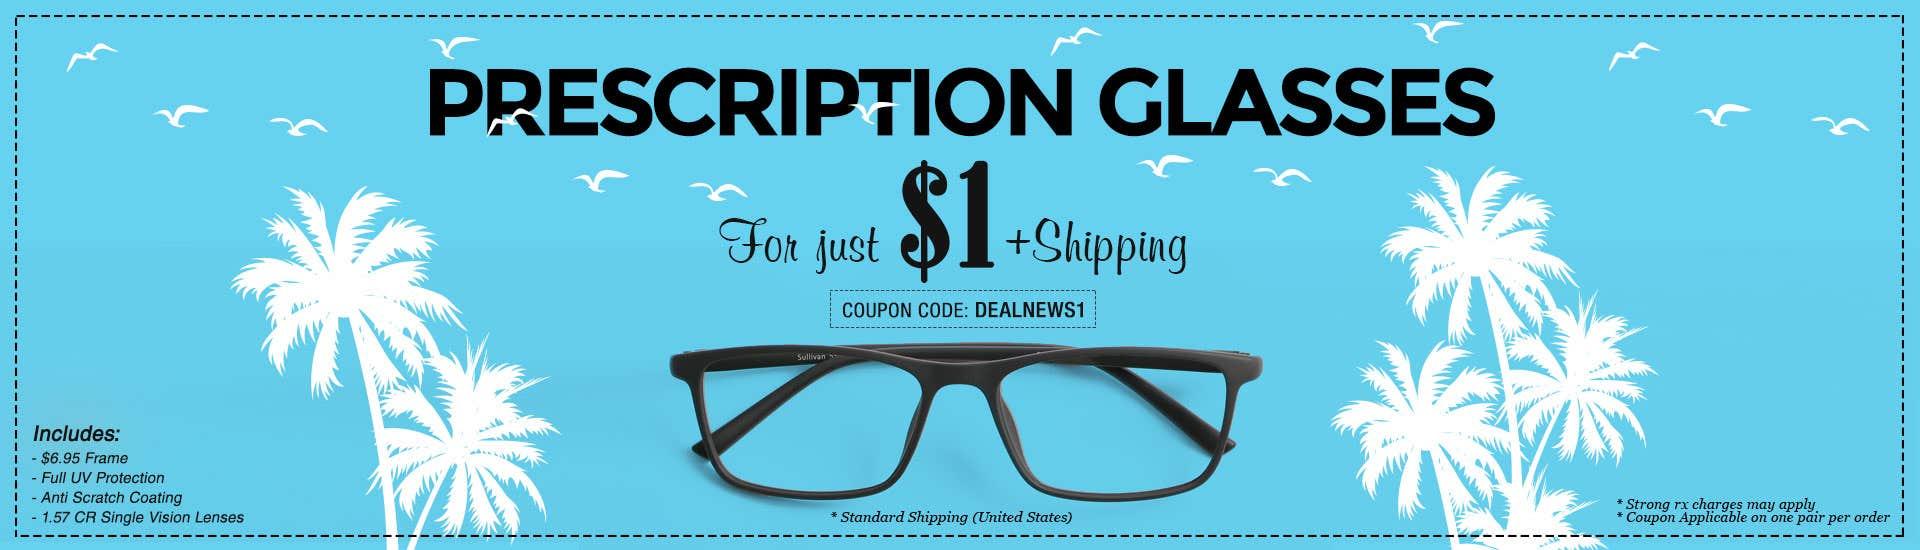 Prescription Eyeglasses | Goggles4u